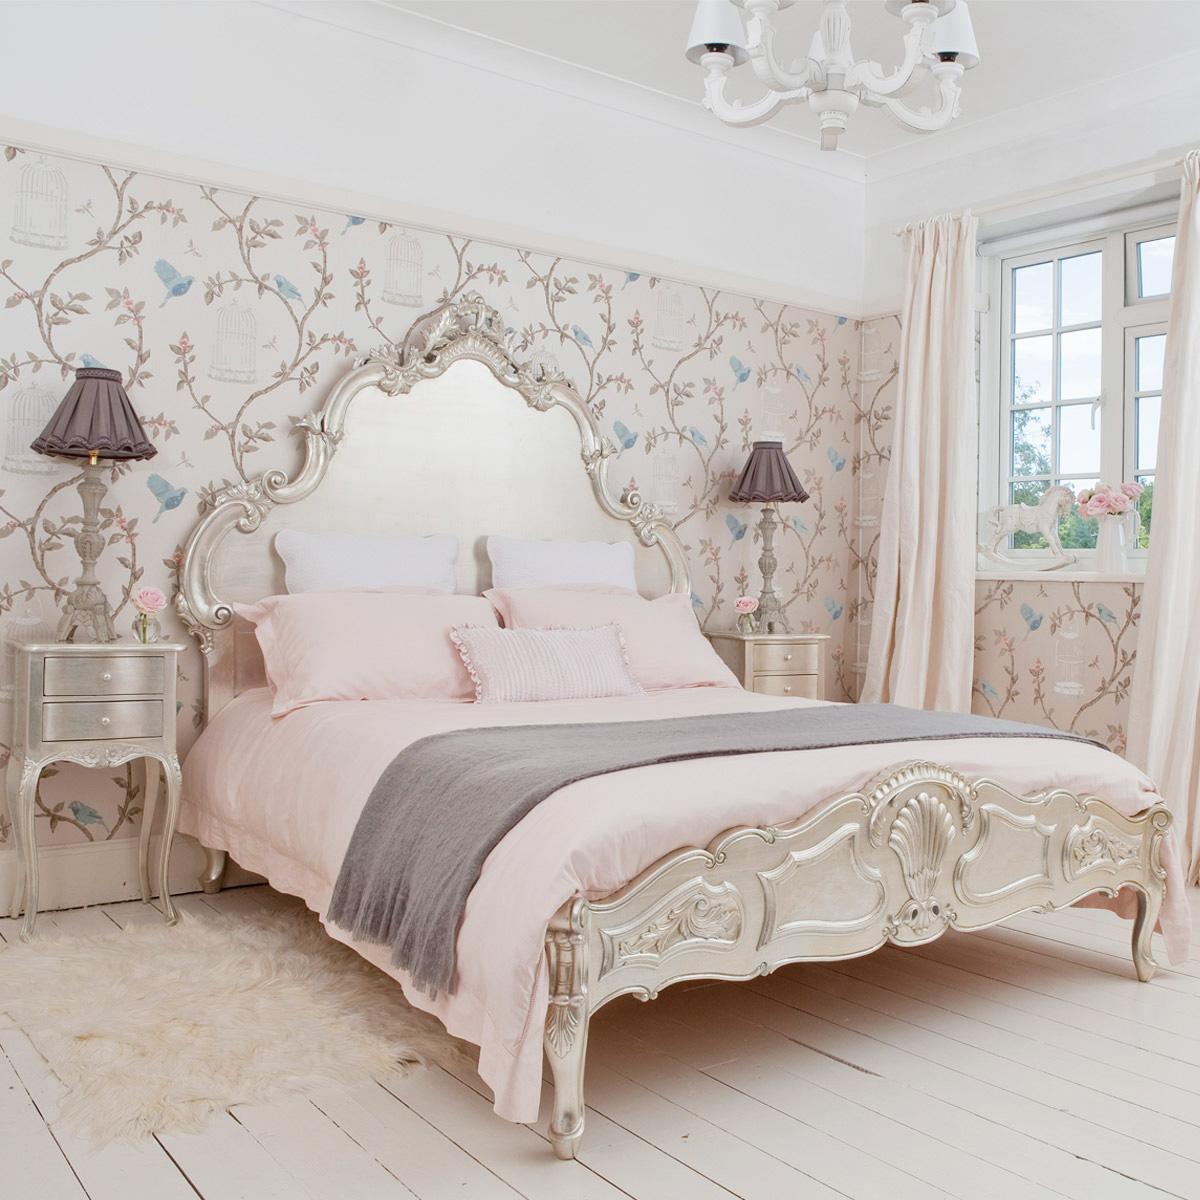 صورة ورق جدران غرف نوم , جملي غرفة نومك باجمد ورق حائط 🤫 6392 1